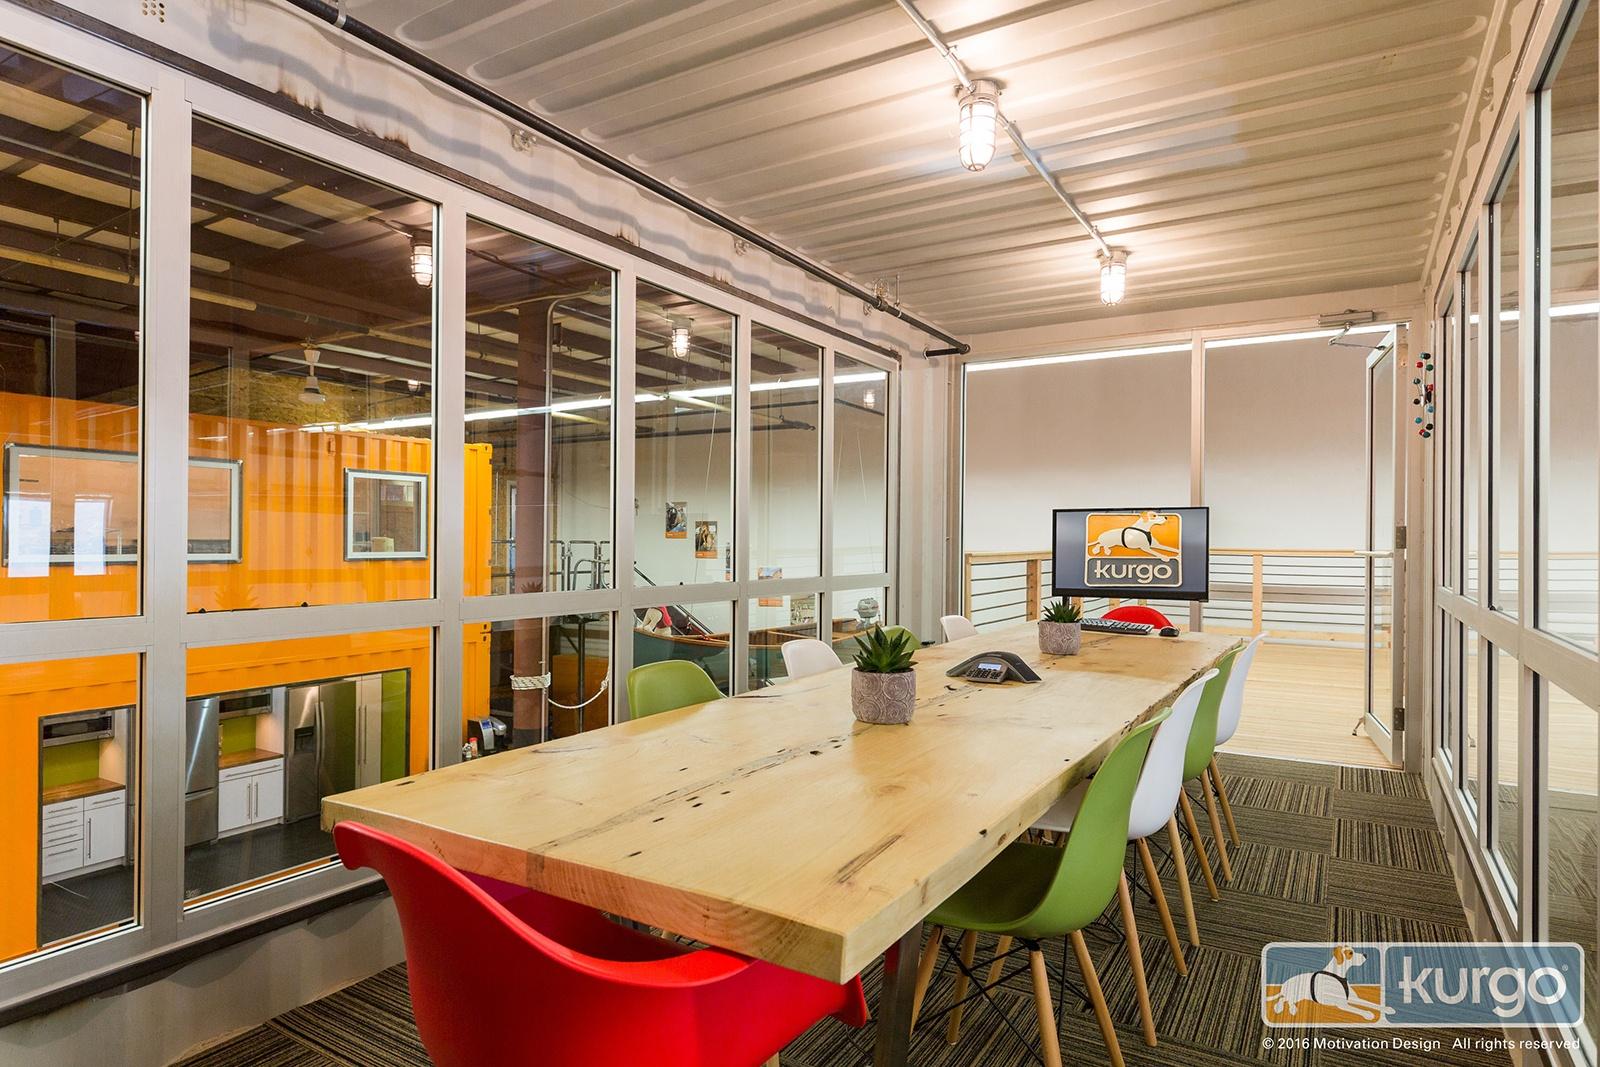 A Tour of Kurgo's Cool Dog Friendly Office - Officelovin'